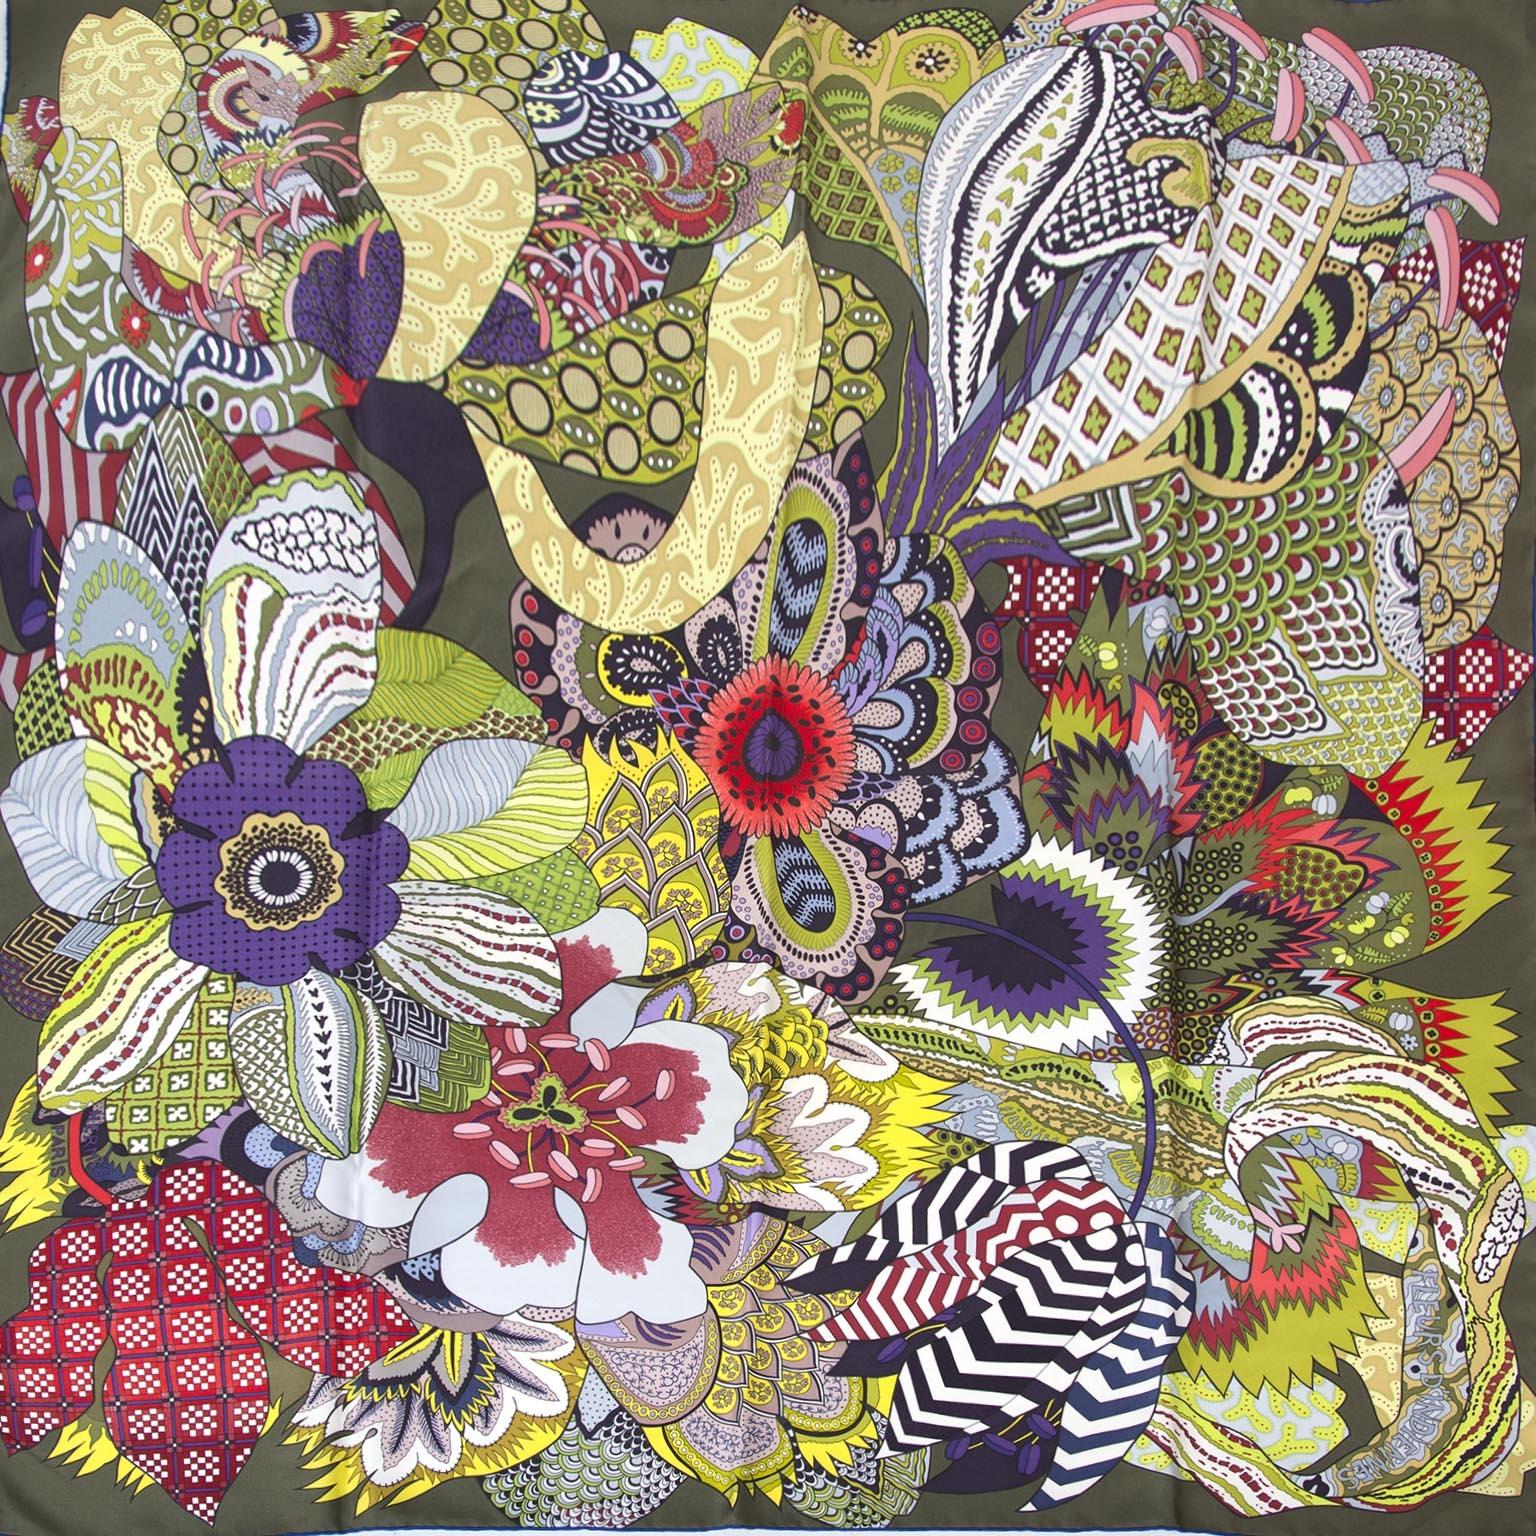 hermes carre silk scarf fleur d'indiennes now for sale at labellov vintage fashion webshop belgium